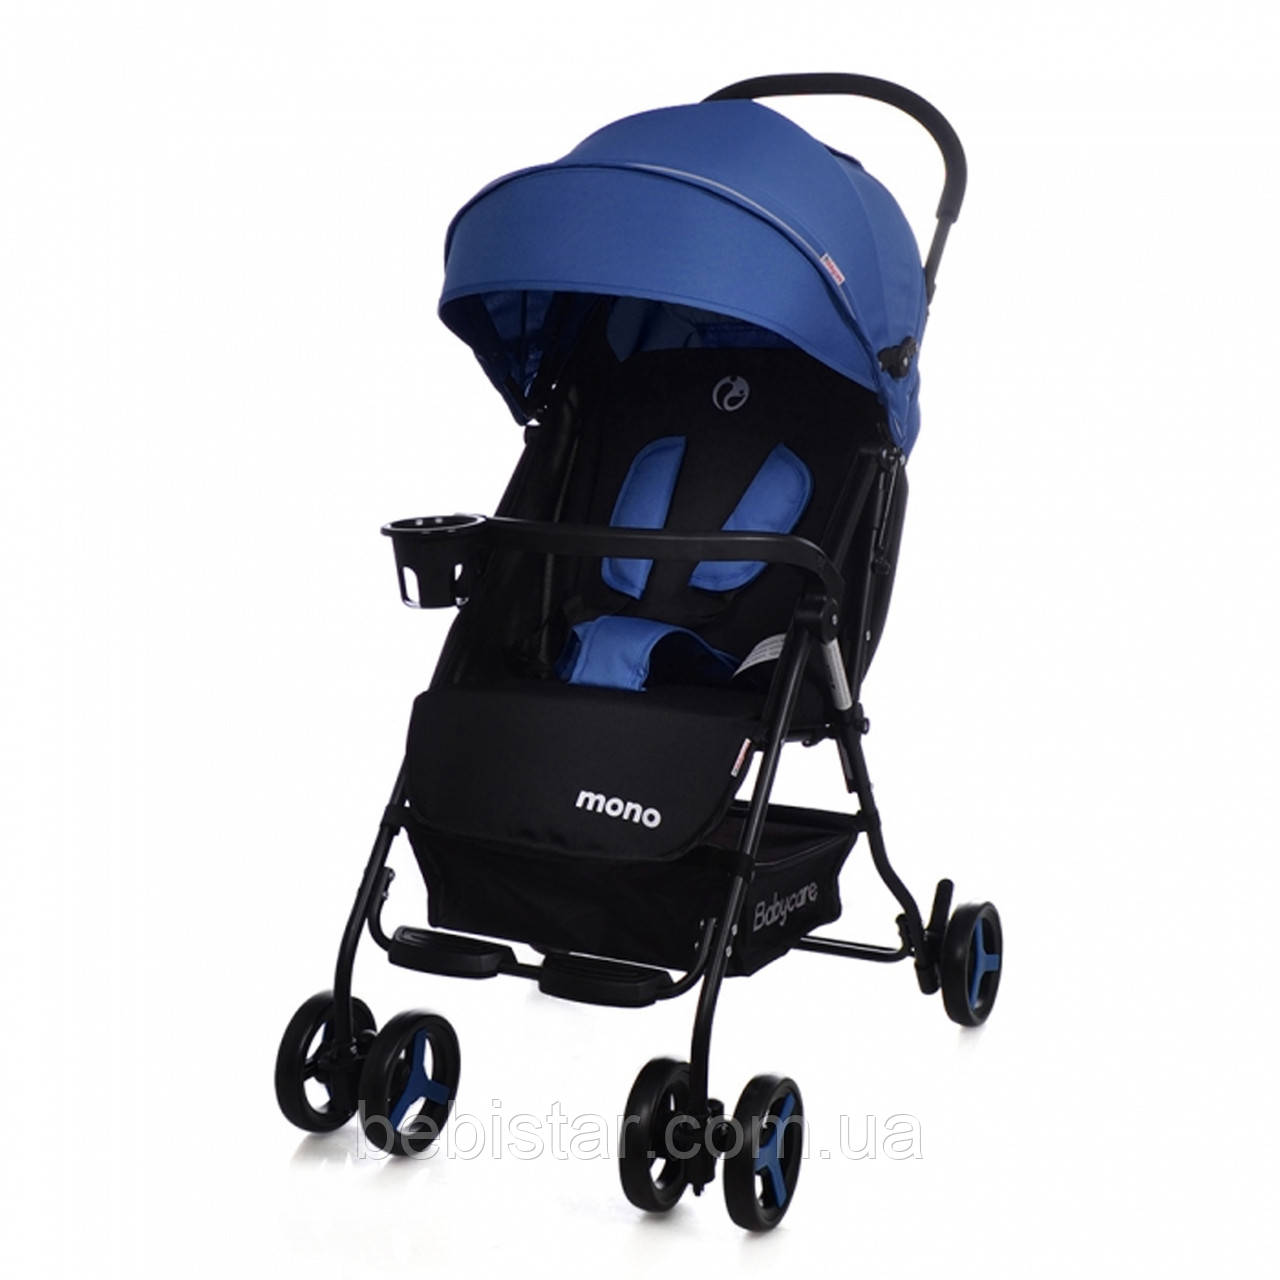 Детская коляска BABYCARE Mono BC-1417 Blue для деток 6 до 36 месяцев